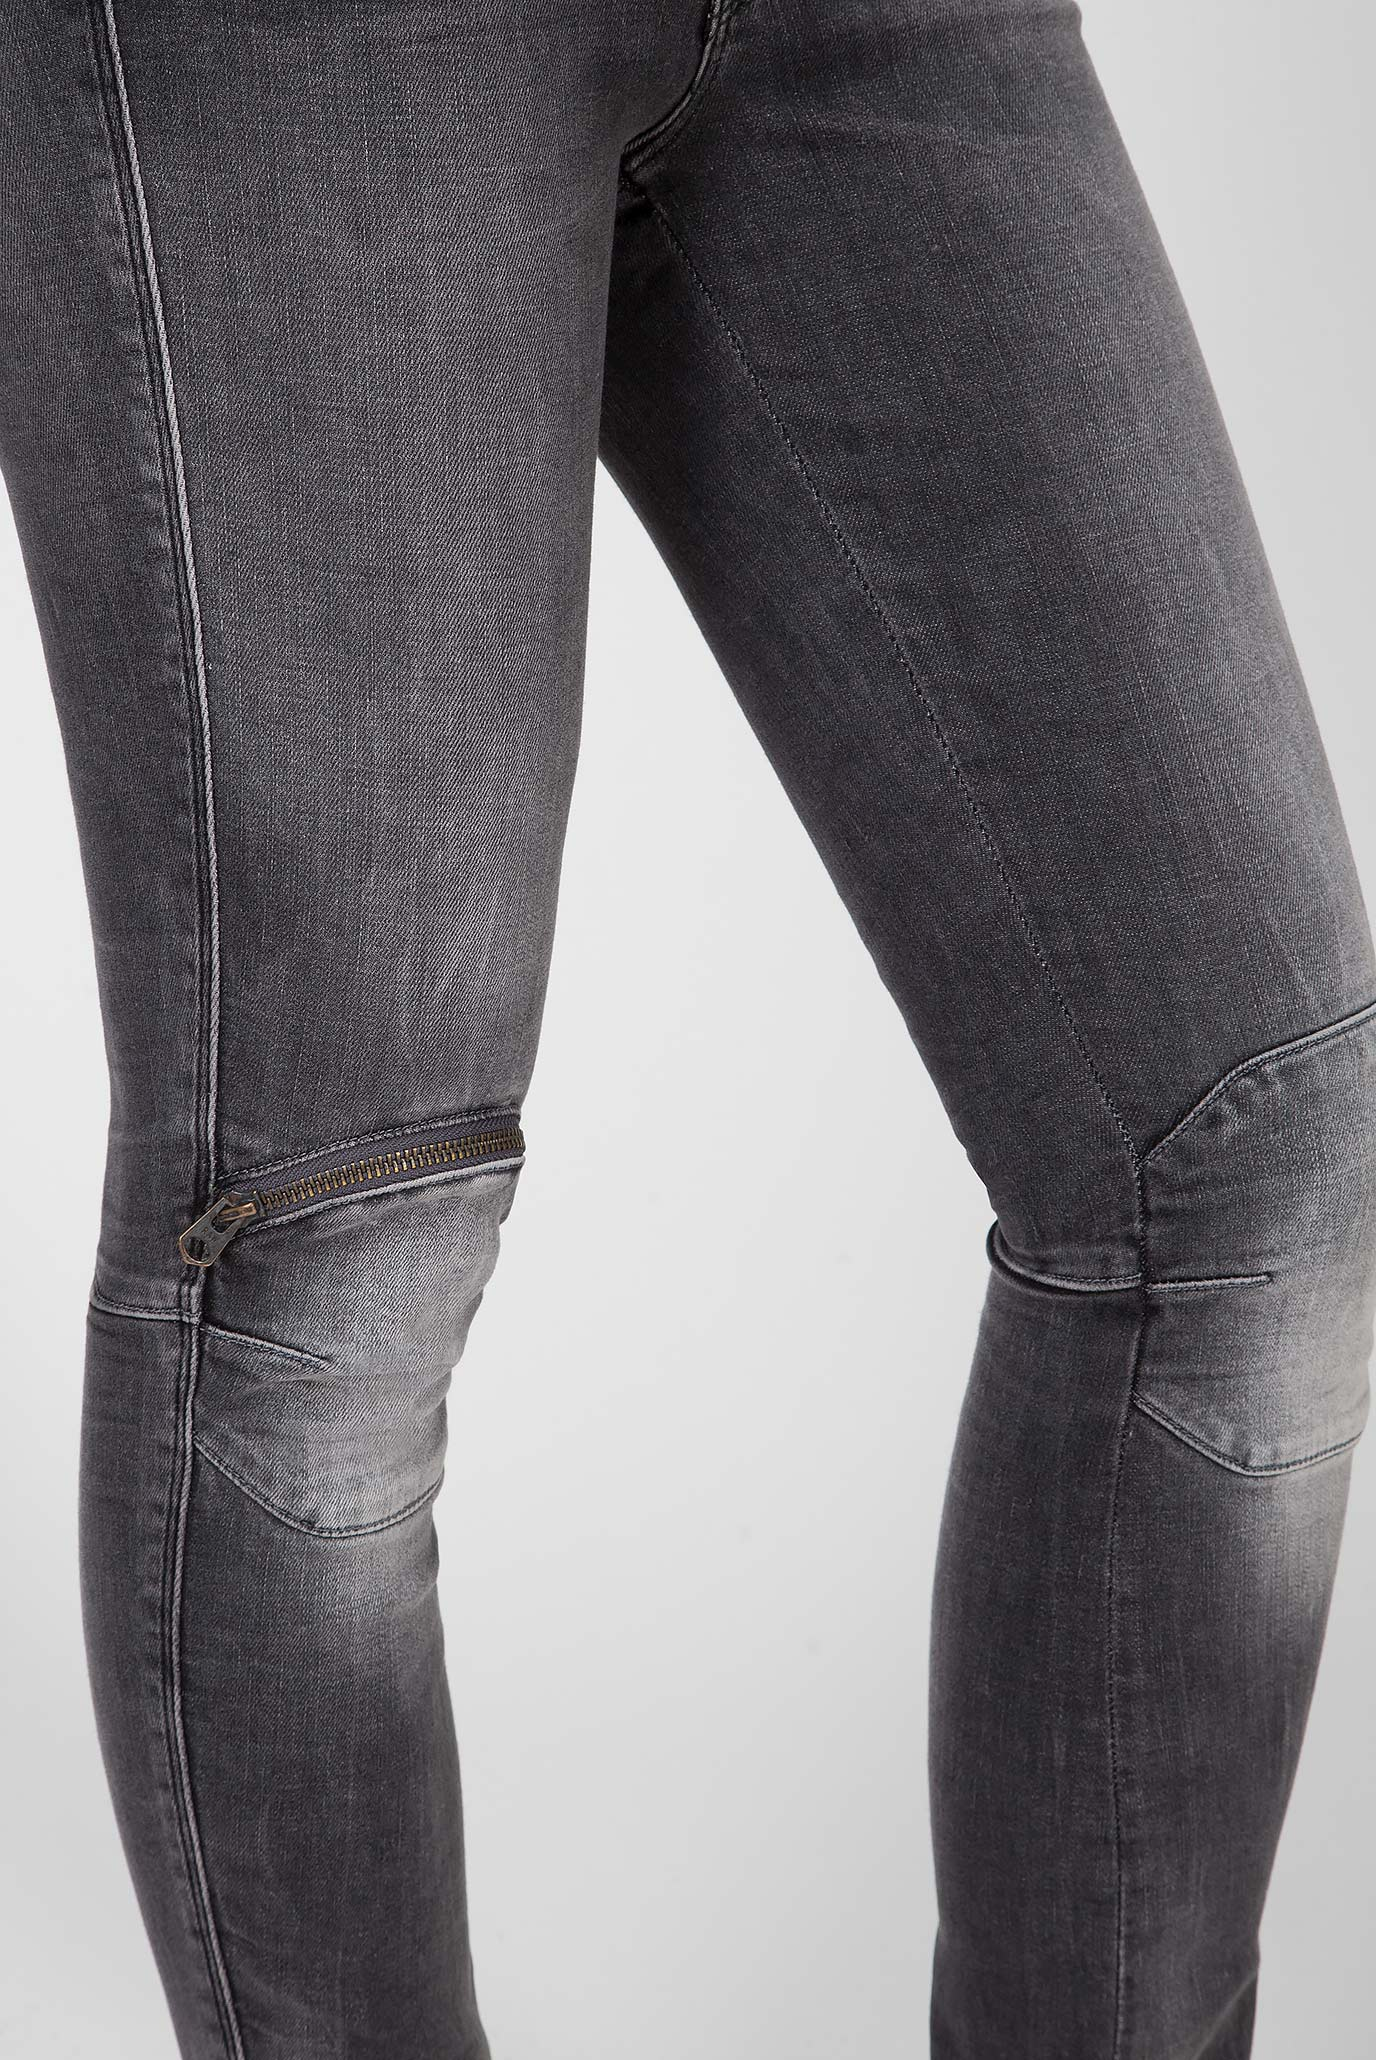 Женские серые джинсы 5622 Knee Zip High Skinny Wmn G-Star RAW